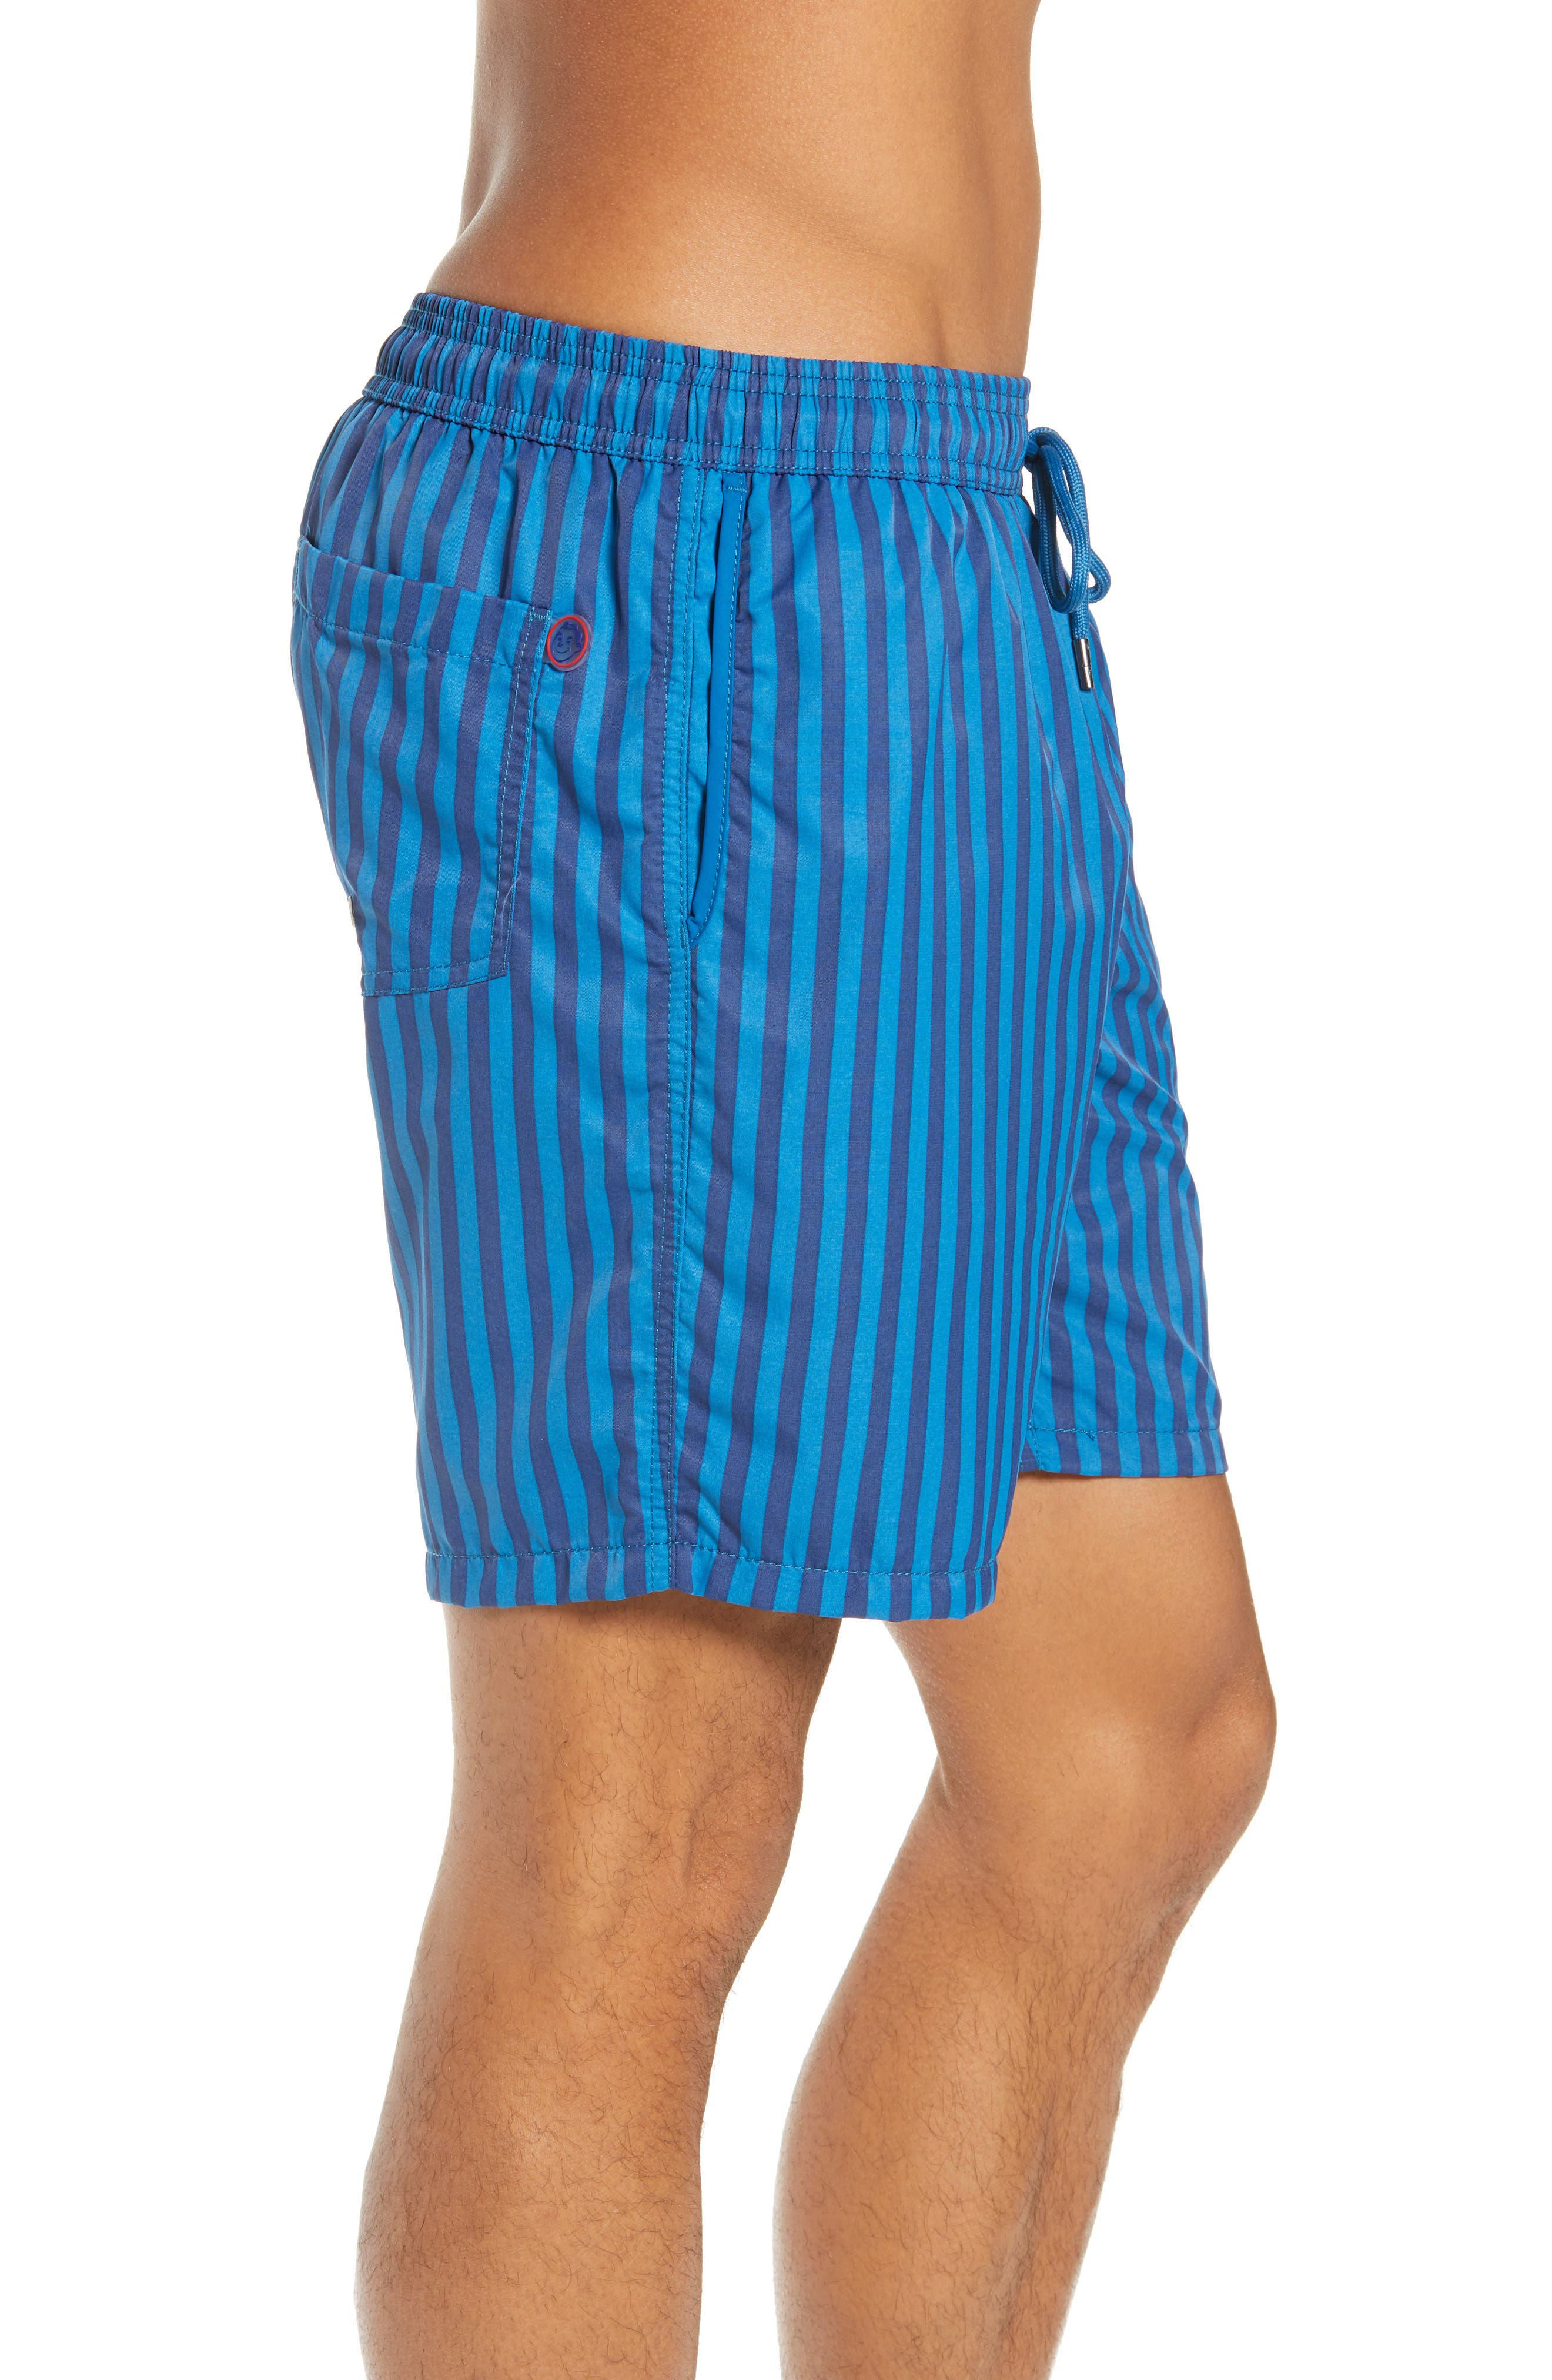 Mr. Swim Cabana Stripe Swim Trunks,                             Alternate thumbnail 3, color,                             NAVY/ ROYAL